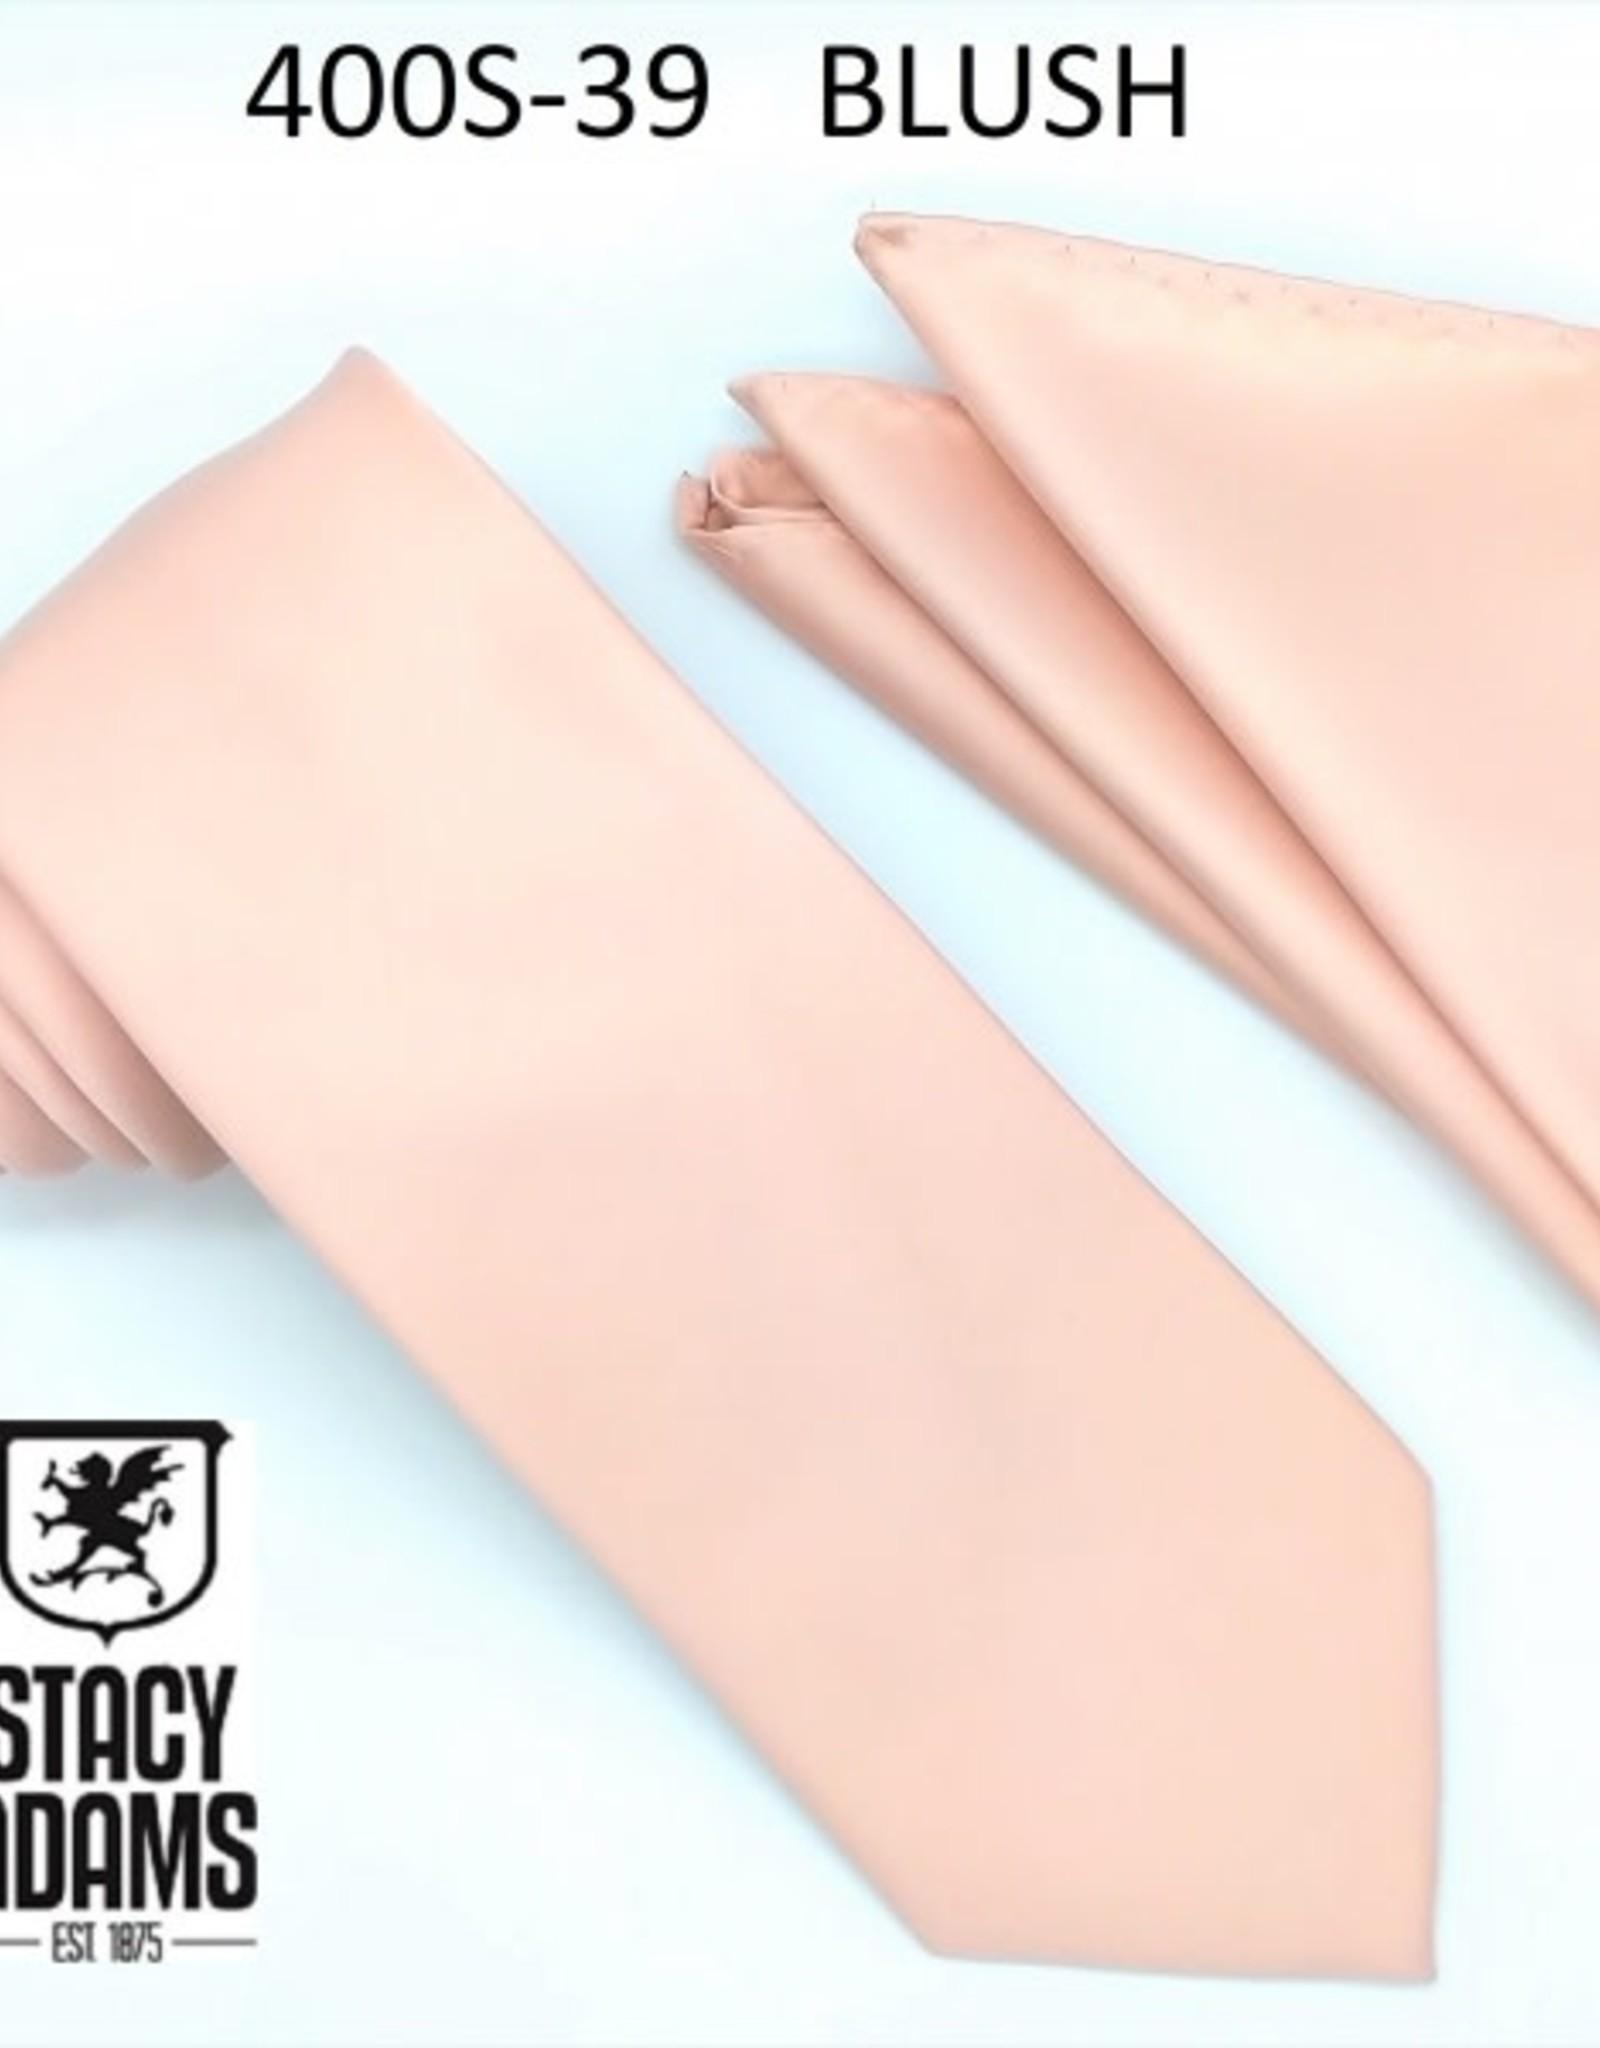 Stacy Adams Tie Stacy Adams Reg 400S-39 Blush